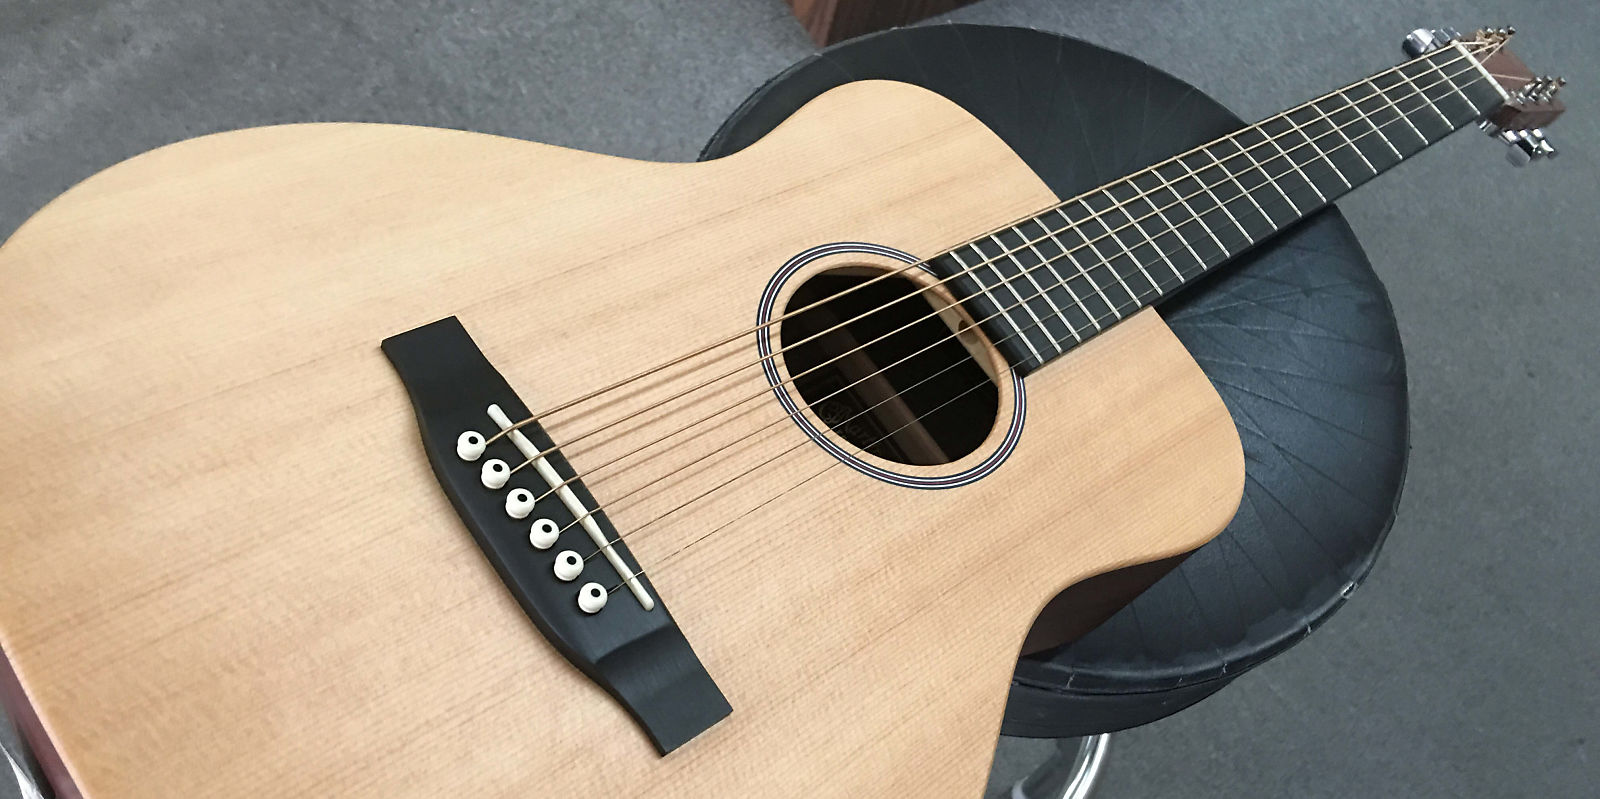 martin lx1 little martin travel acoustic guitar reverb. Black Bedroom Furniture Sets. Home Design Ideas